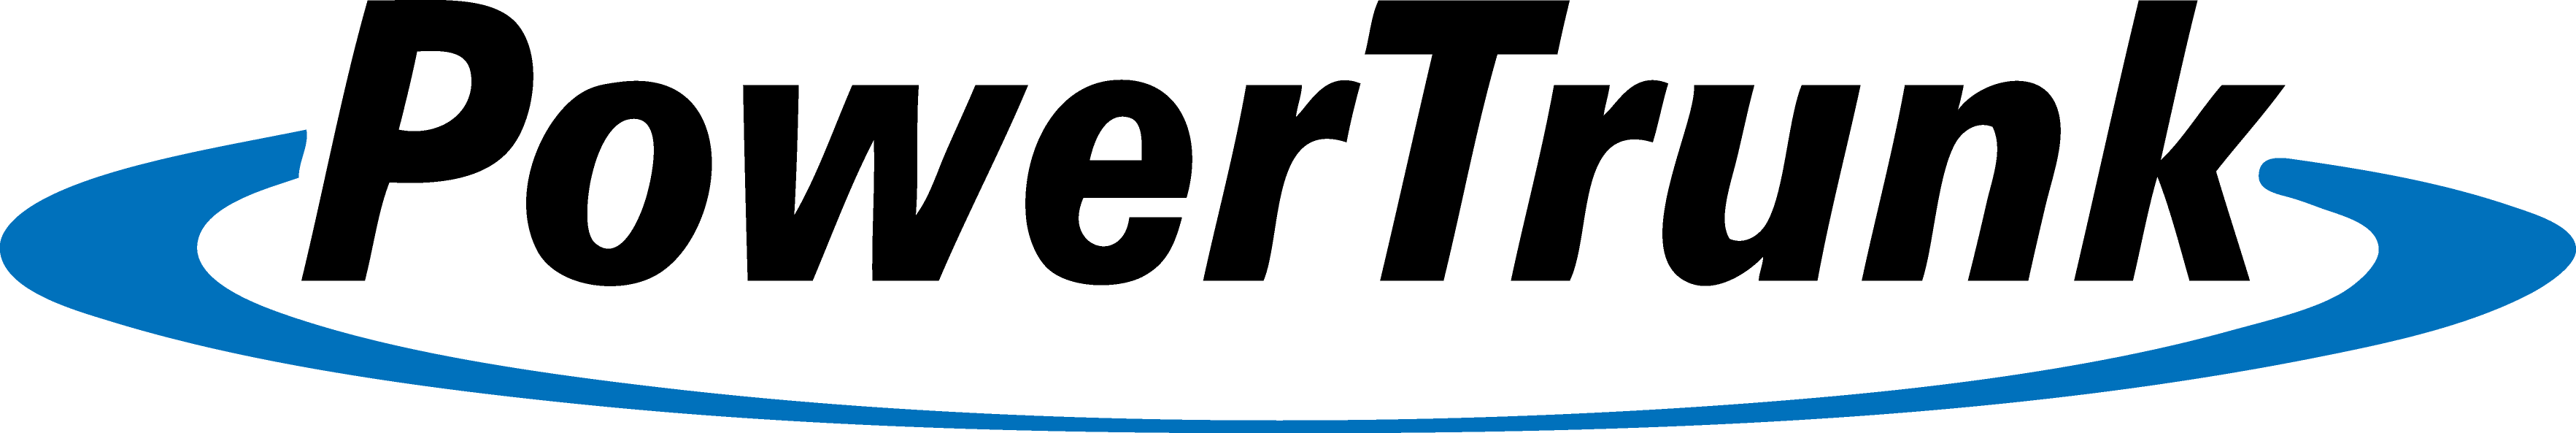 logo PowerTrunk